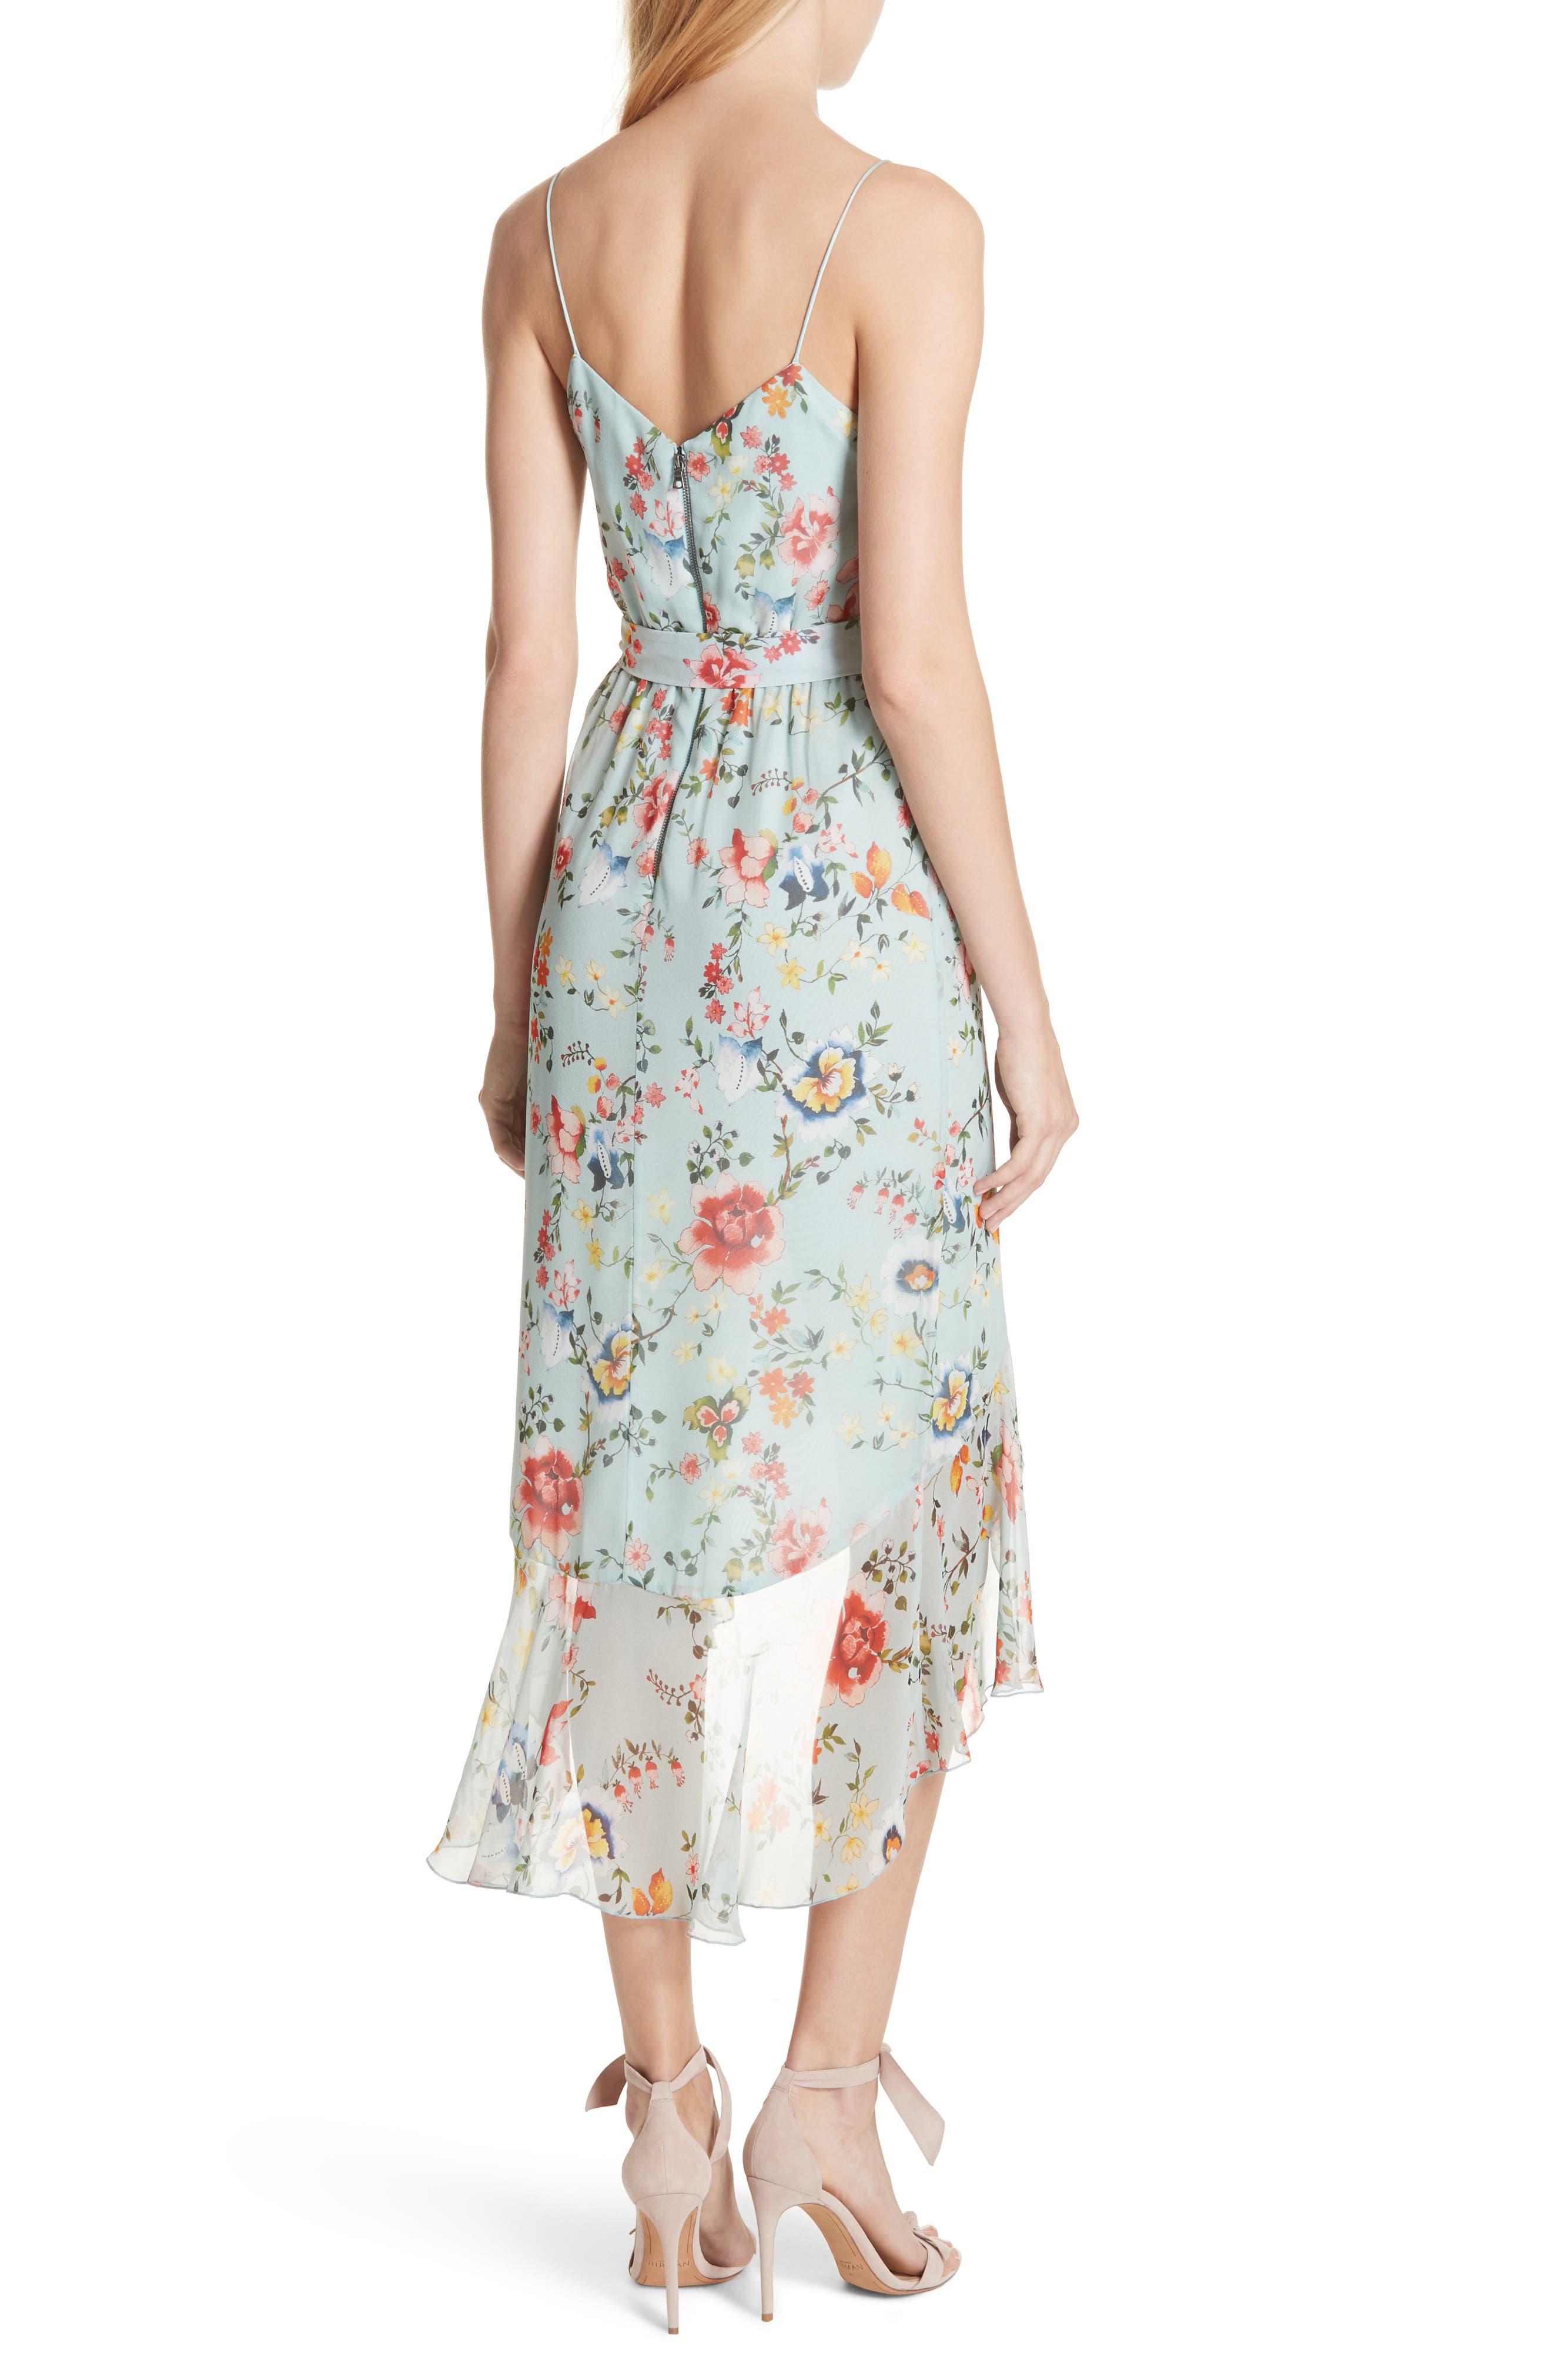 Mable Floral Silk Midi Dress,                             Alternate thumbnail 2, color,                             Floral Soiree-Dusty Aqua